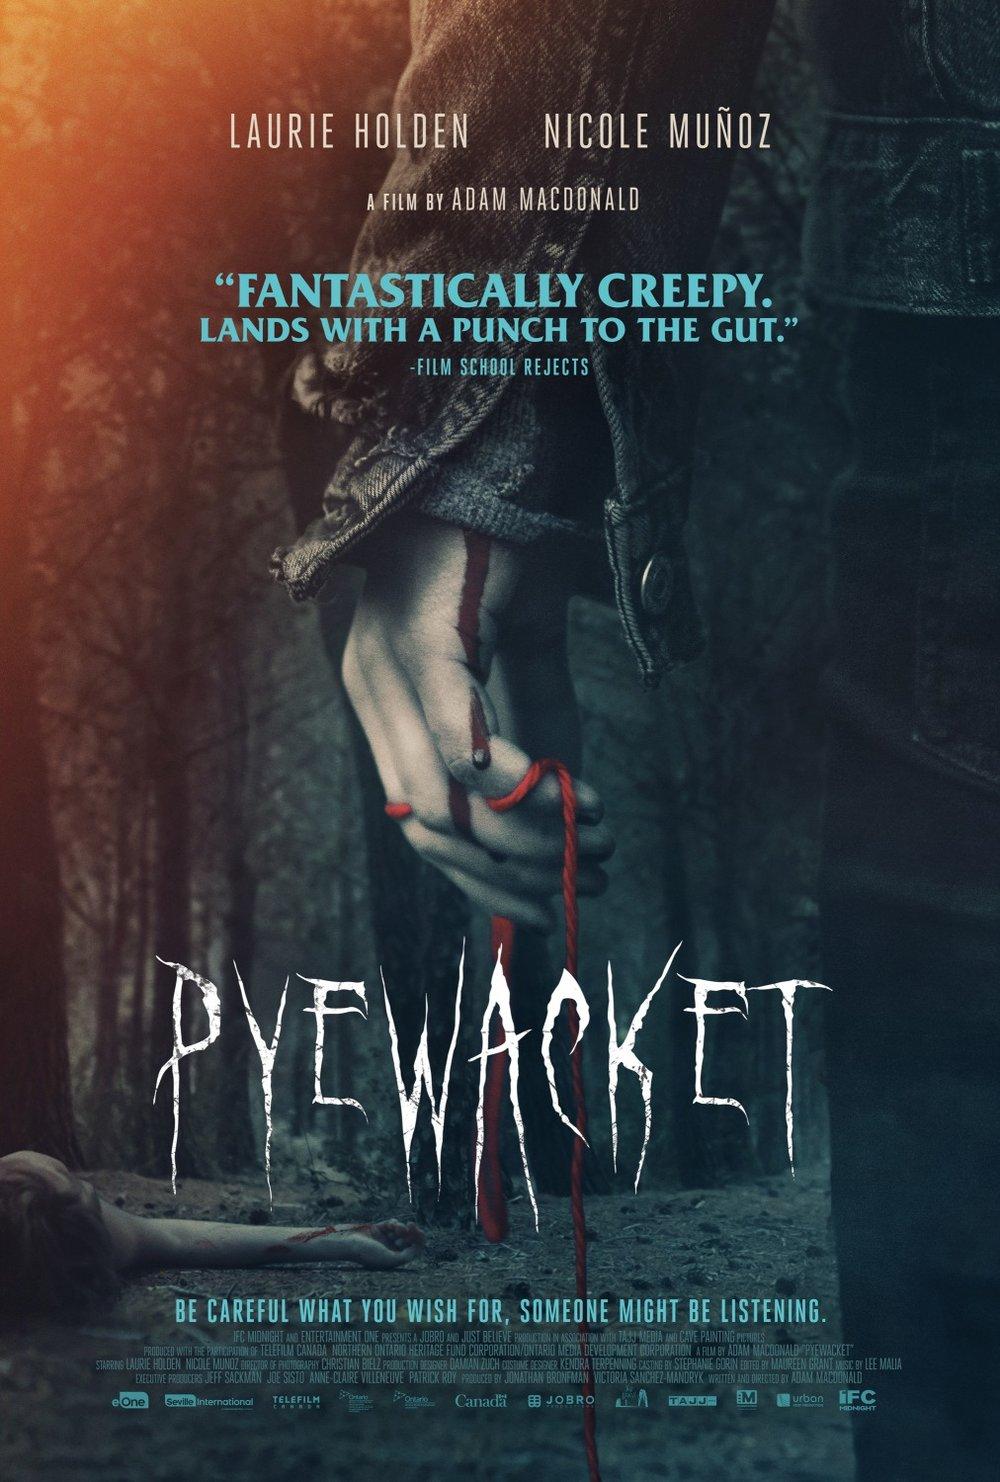 pyewacket_ver2_xlg.jpg